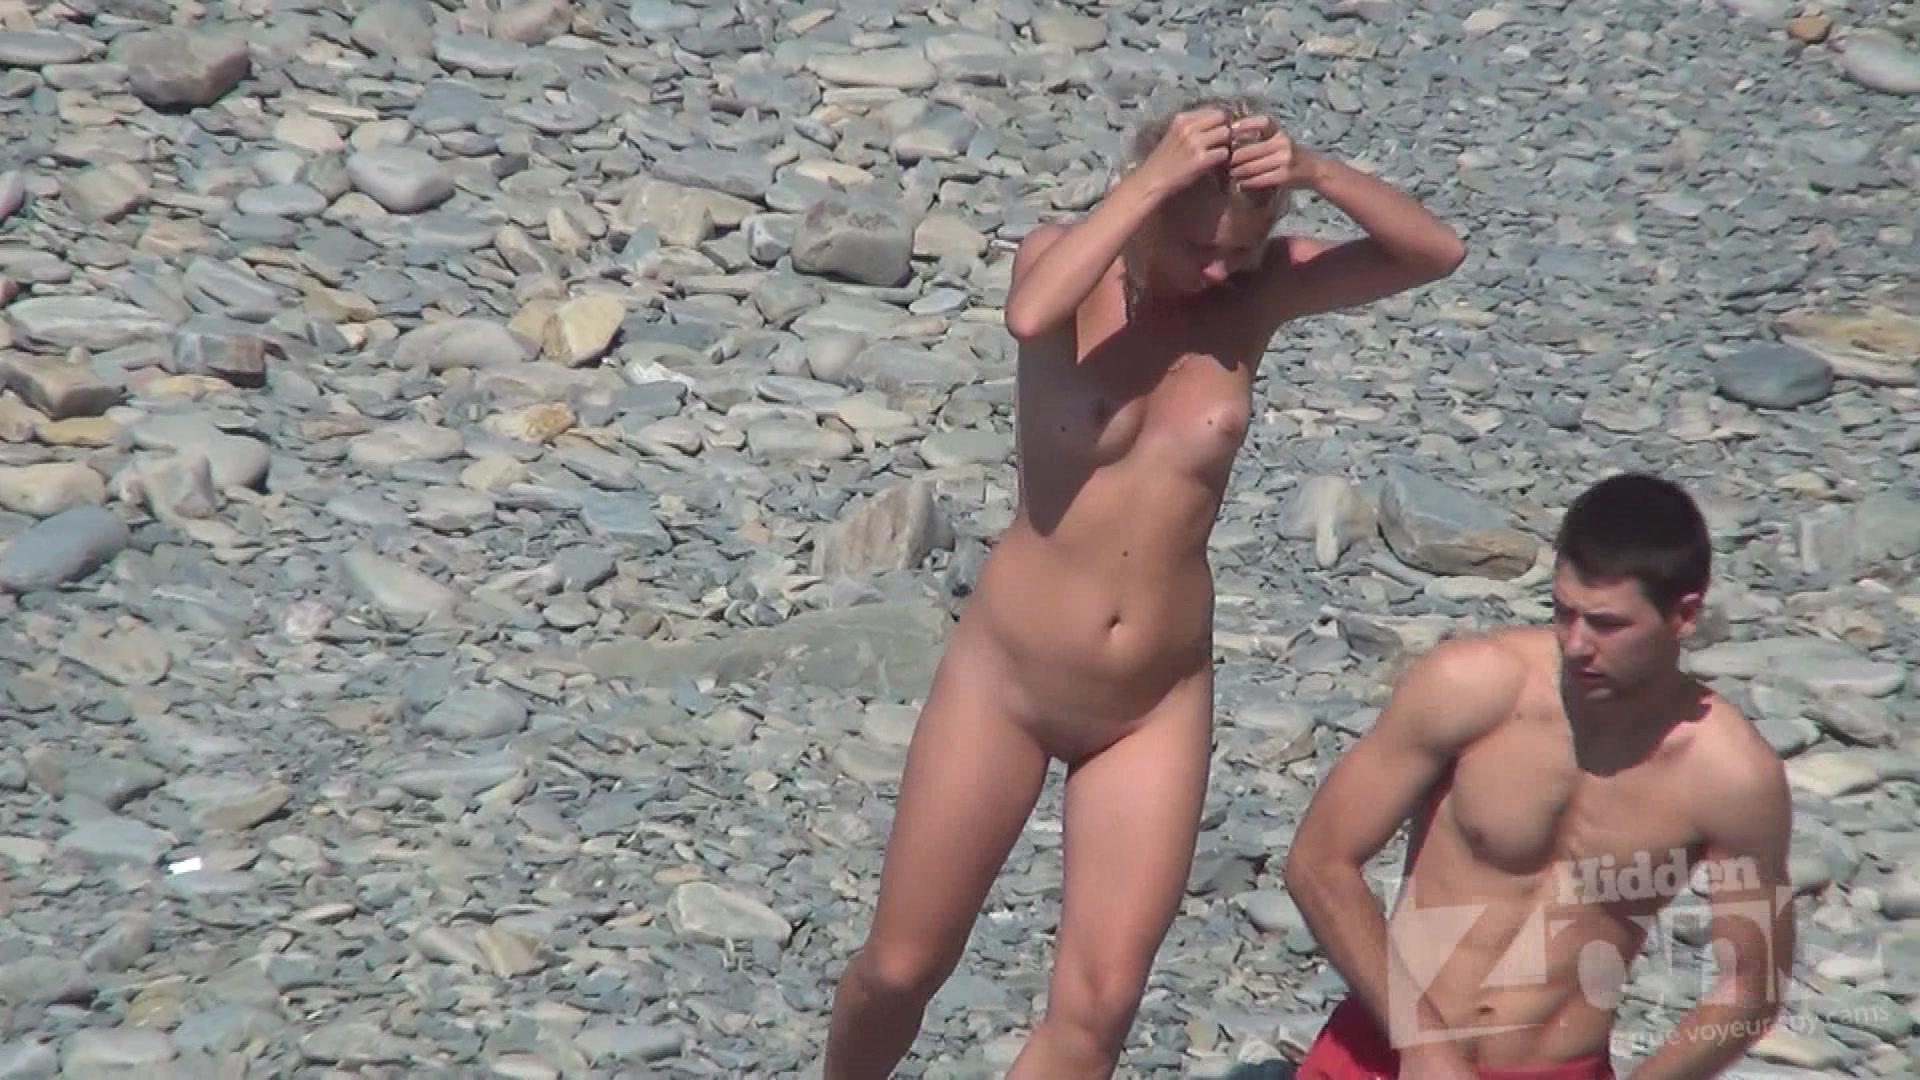 Voyeur mexican undressing sex photo